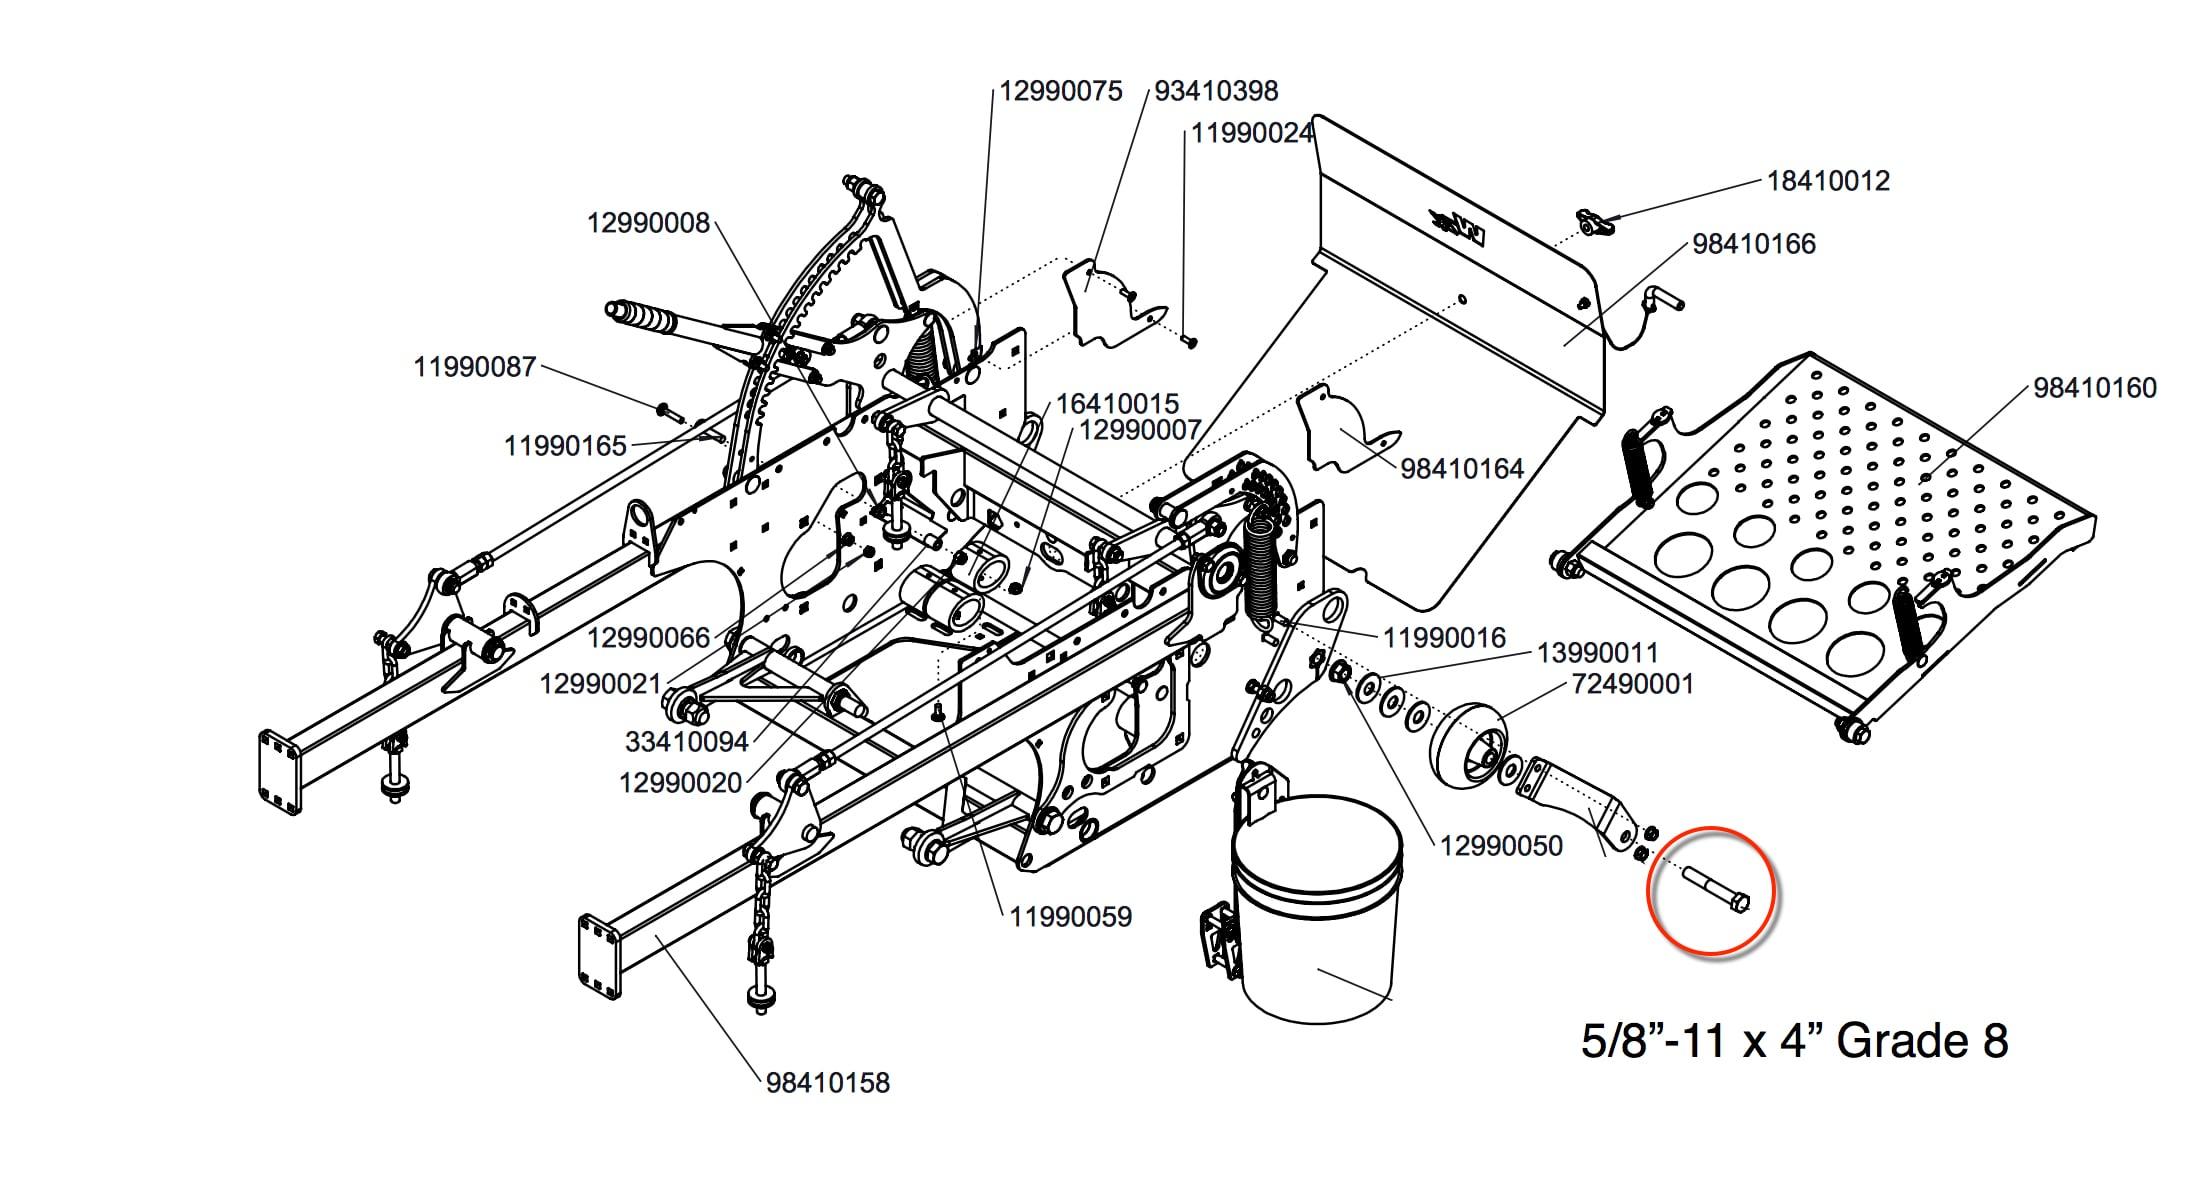 52 wright stander wiring diagram wiring diagram